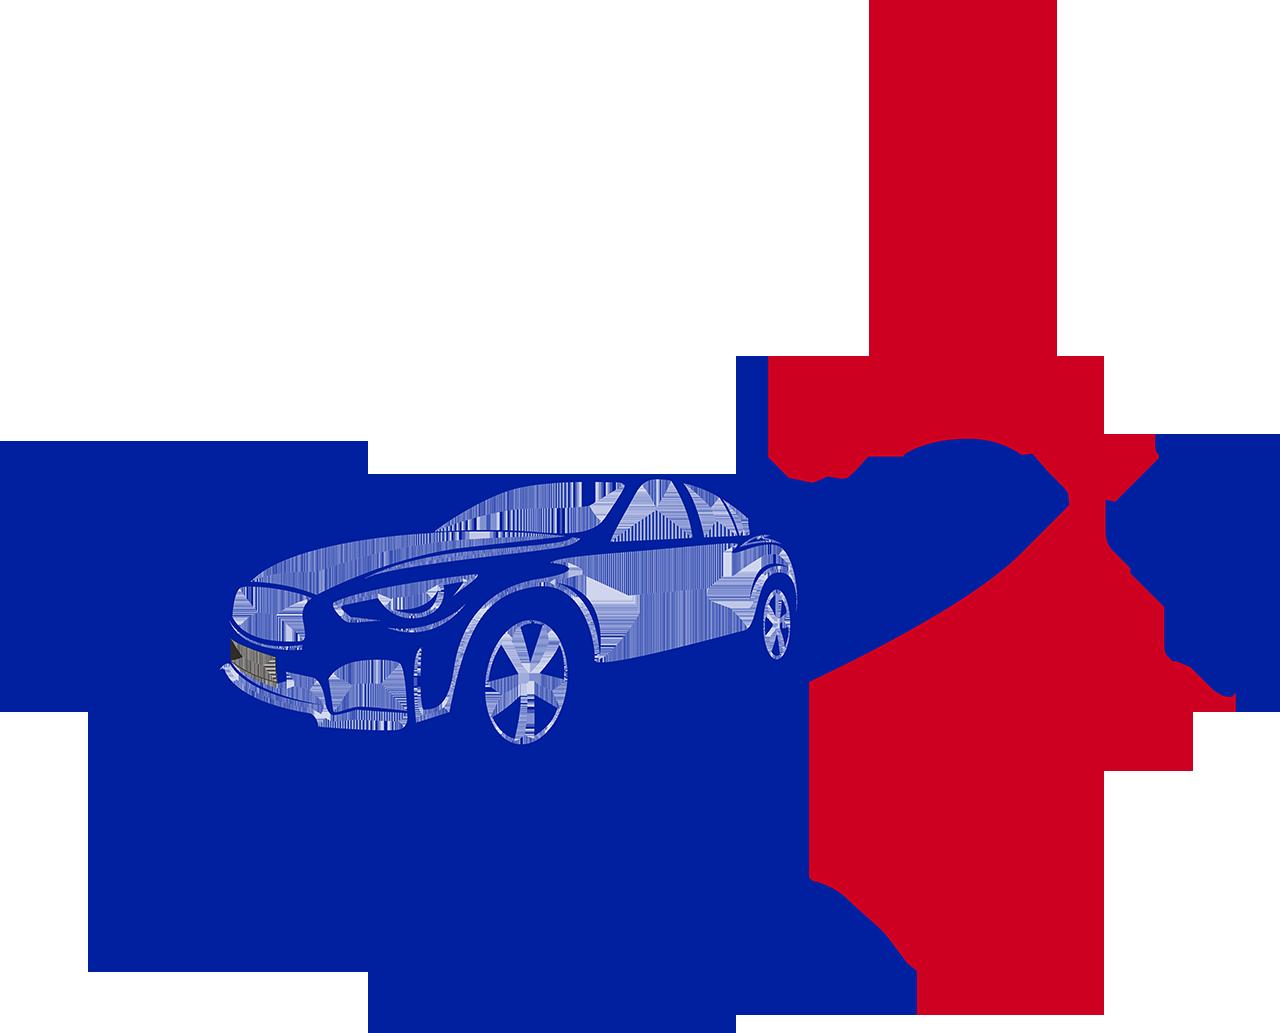 ReserveTonVTC